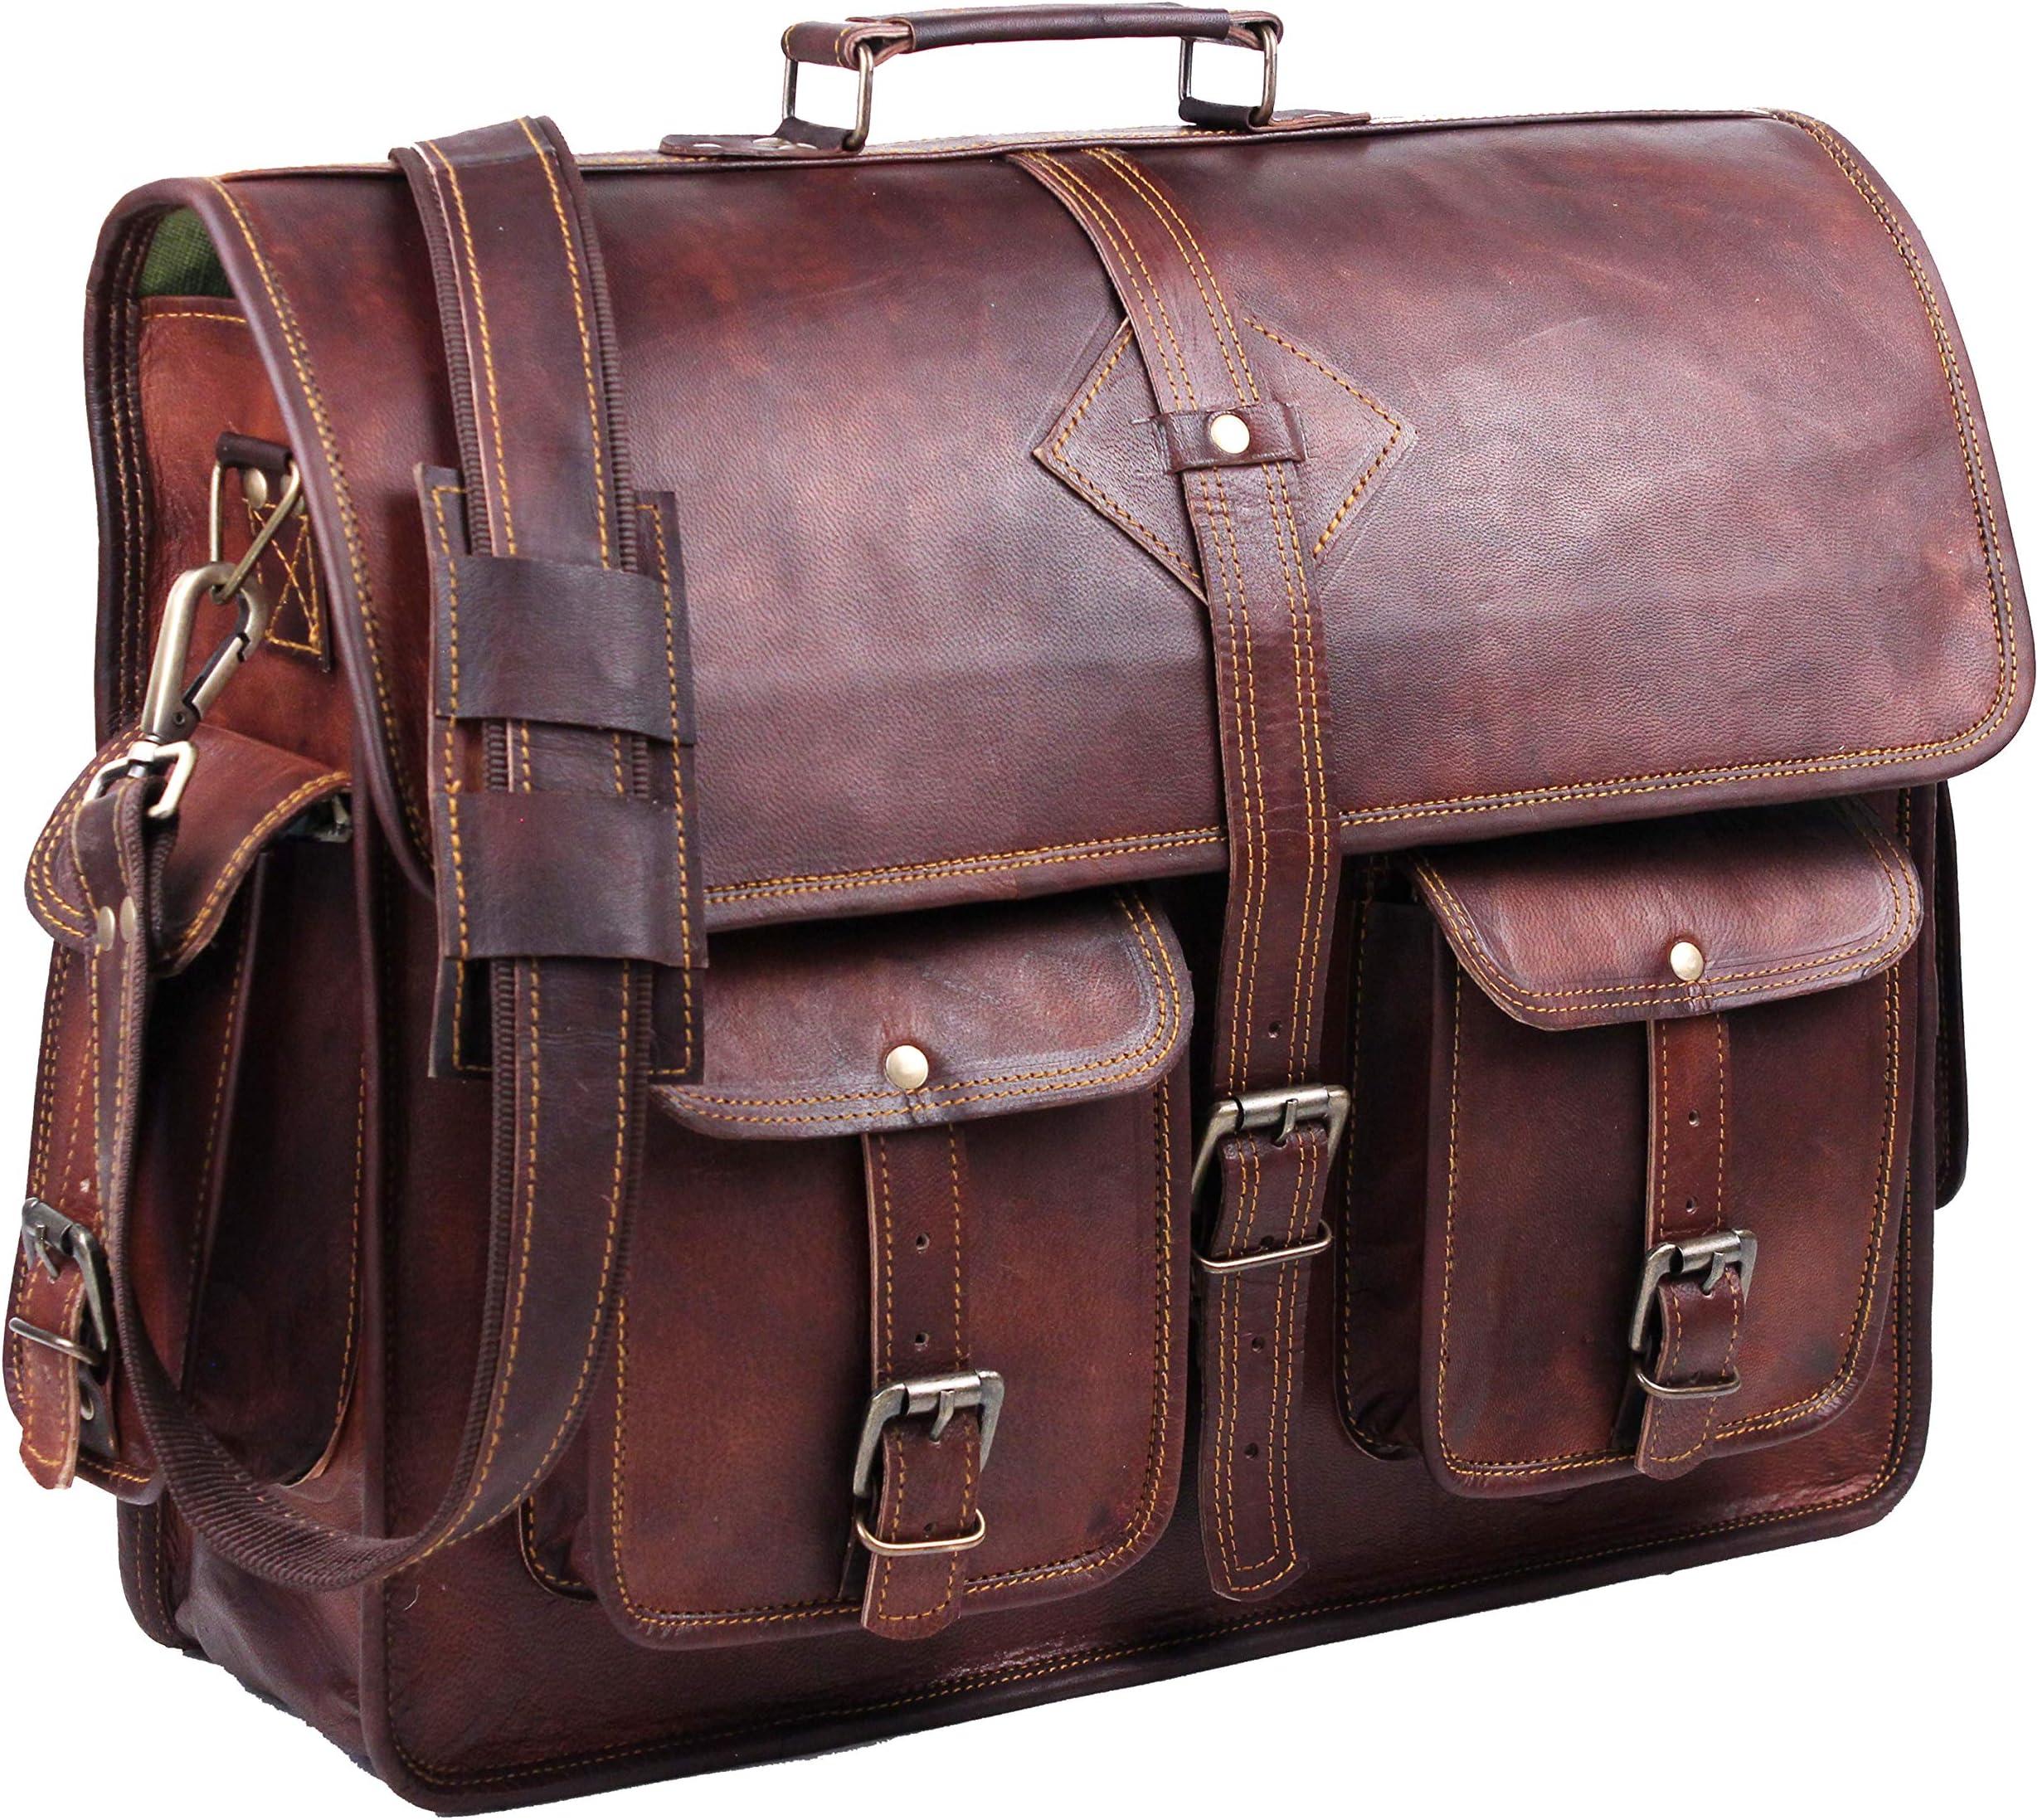 Laptop Bag Large Handbag 15 Inch Laptop Bag Rustic Briefcase  Men women Briefcase